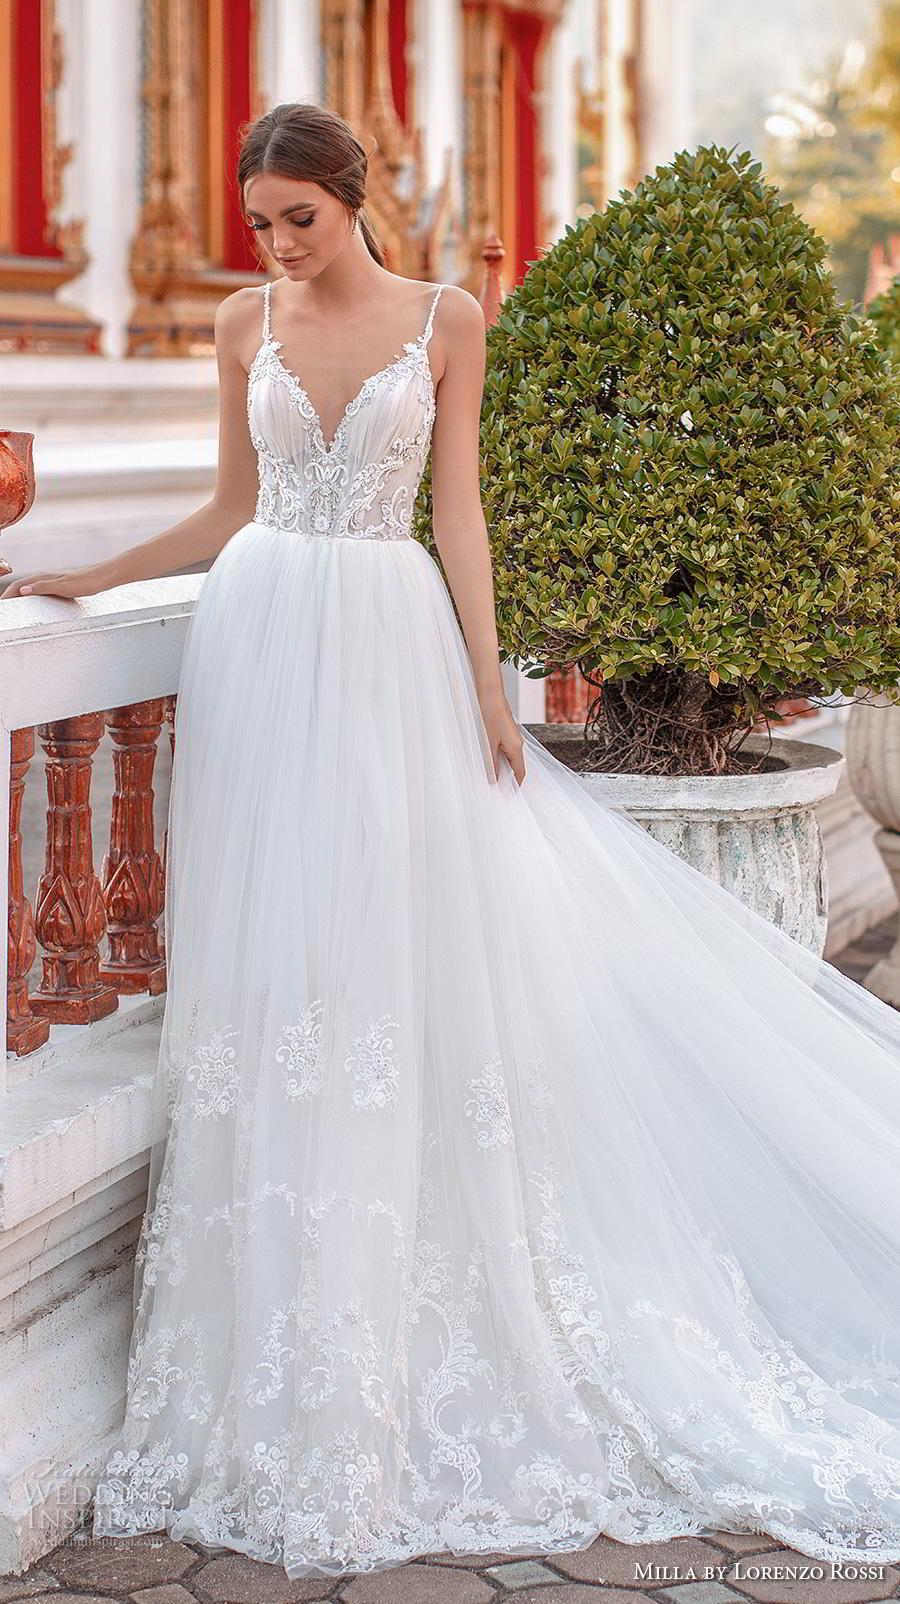 lorenzo rossi 2019 milla bridal sleeveless spaghetti strap diamond neckline heavily embellished bodice romantic soft a  line wedding dress v back royal train (10) mv